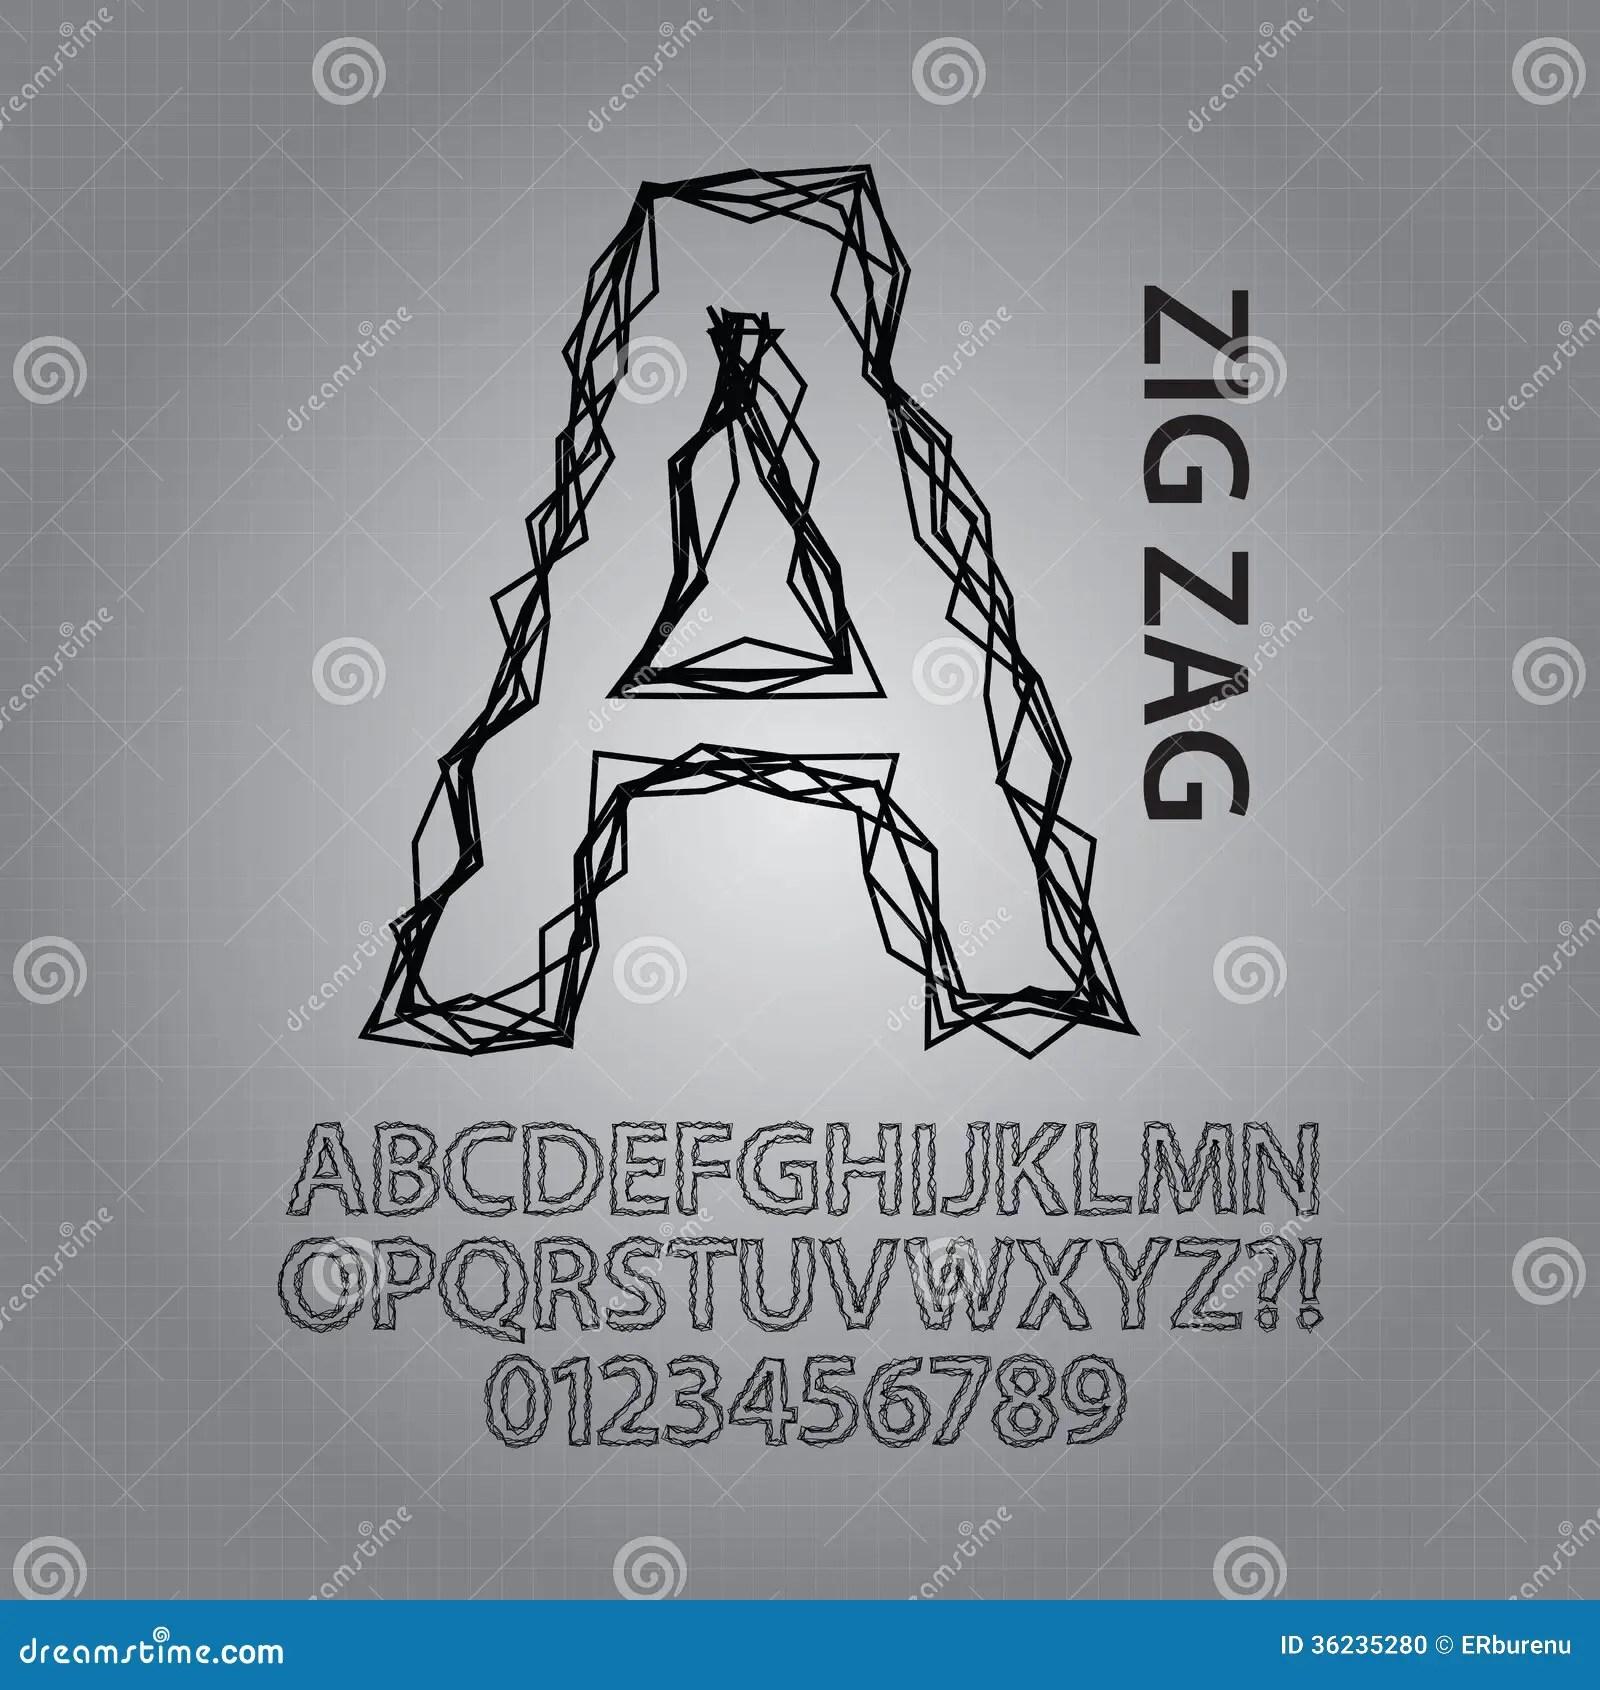 Black Zig Zag Alphabet And Numbers Vector Stock Photo